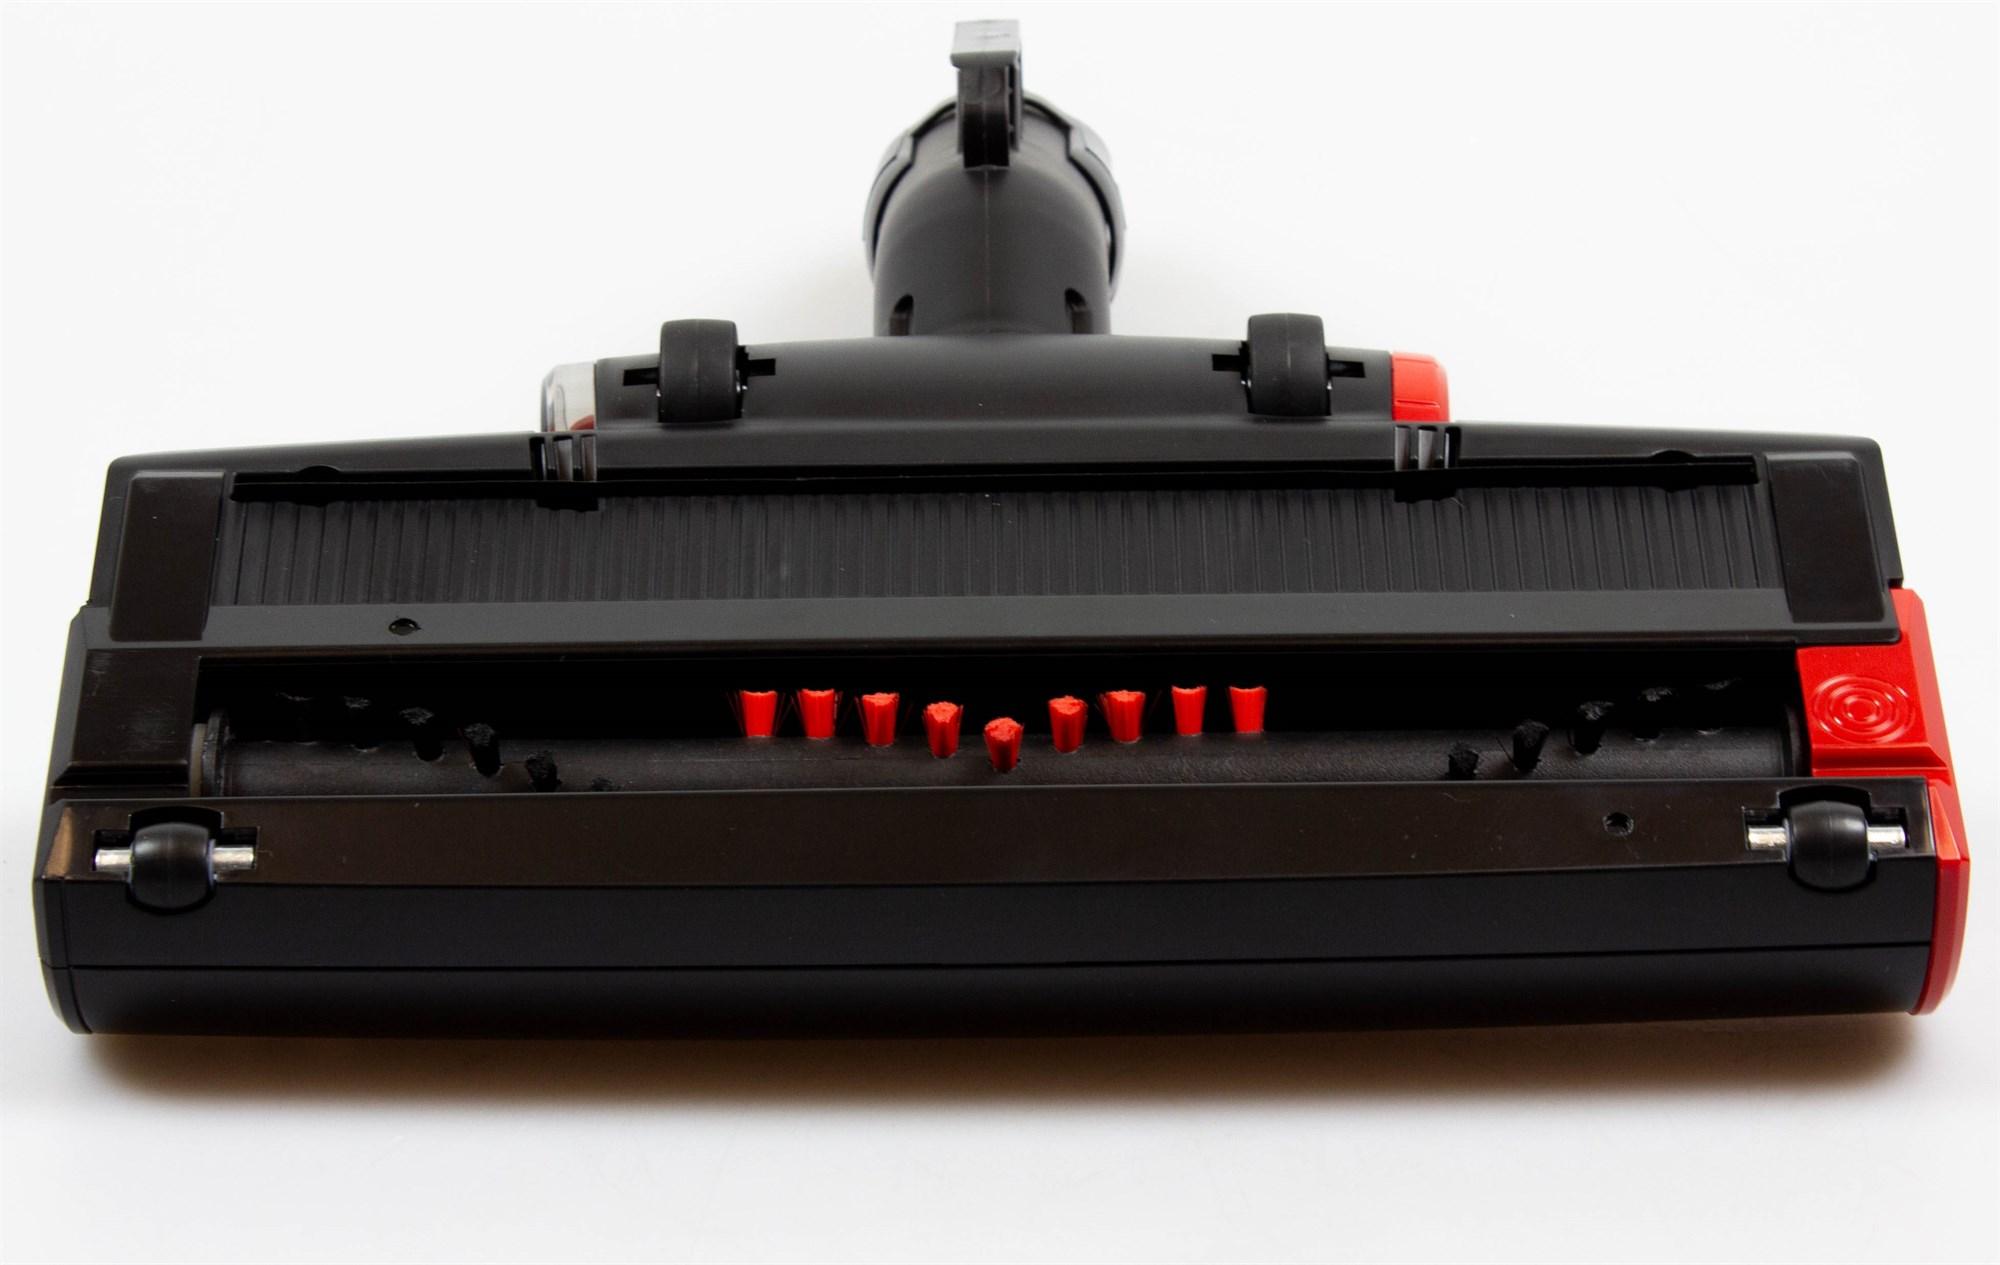 Munnstykke, Bosch støvsuger 35 mm (turbomunnstykke)